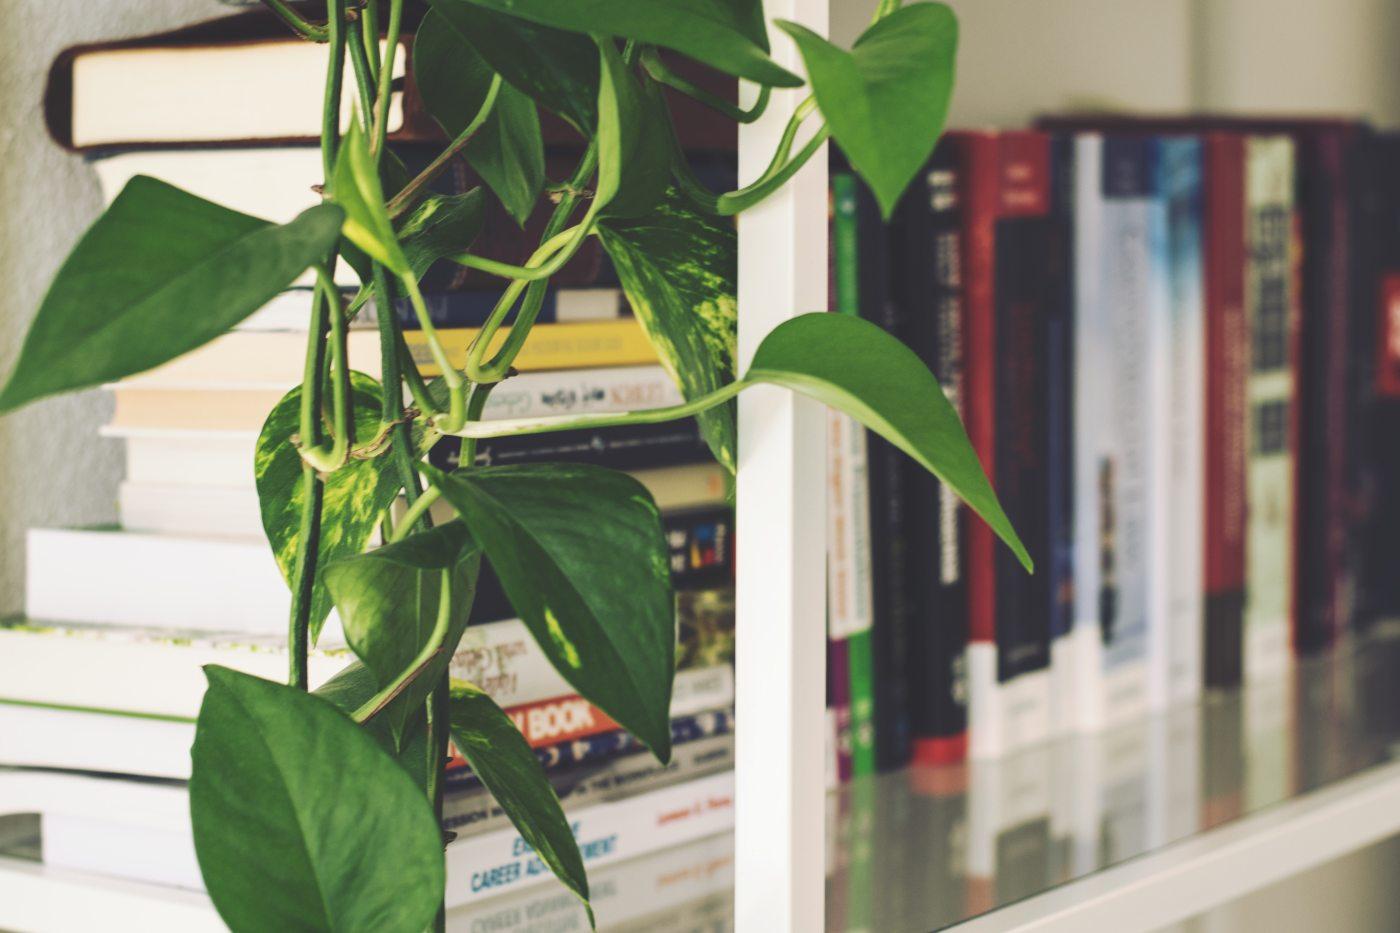 Bookshelf with a plant